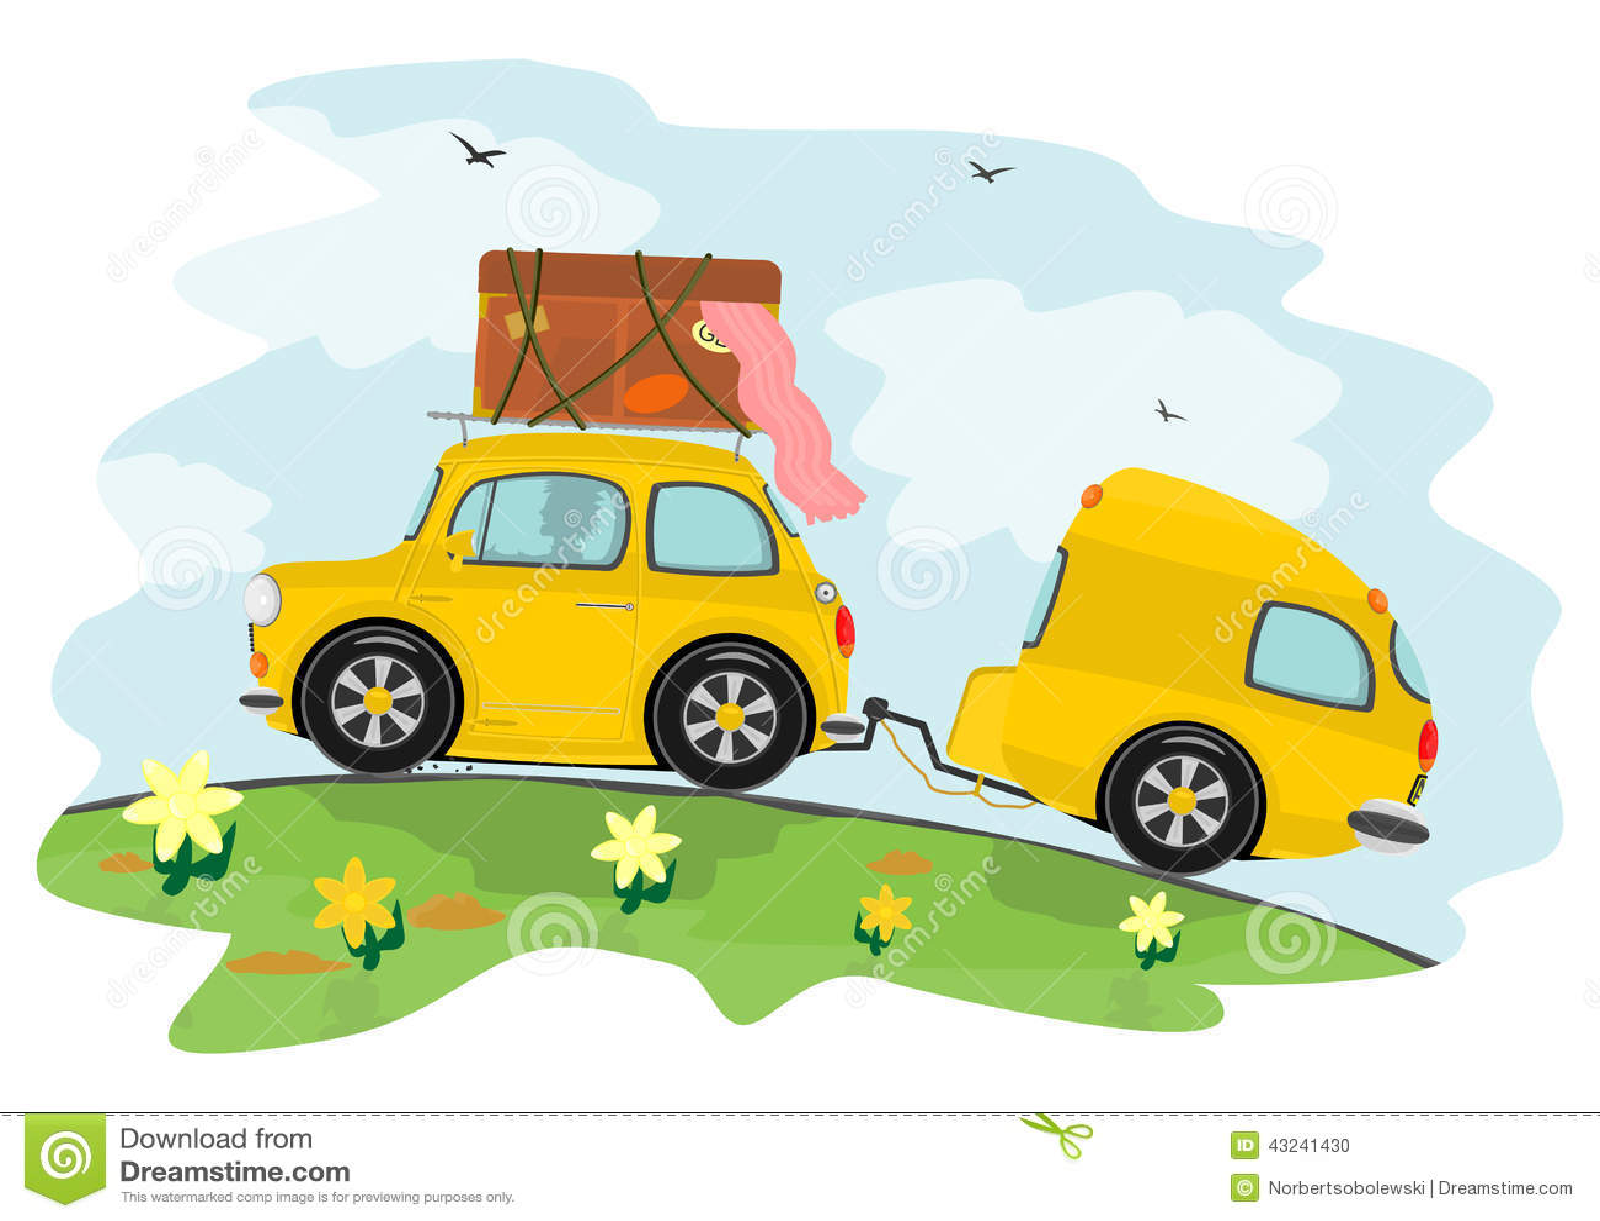 viaje coche caravana: